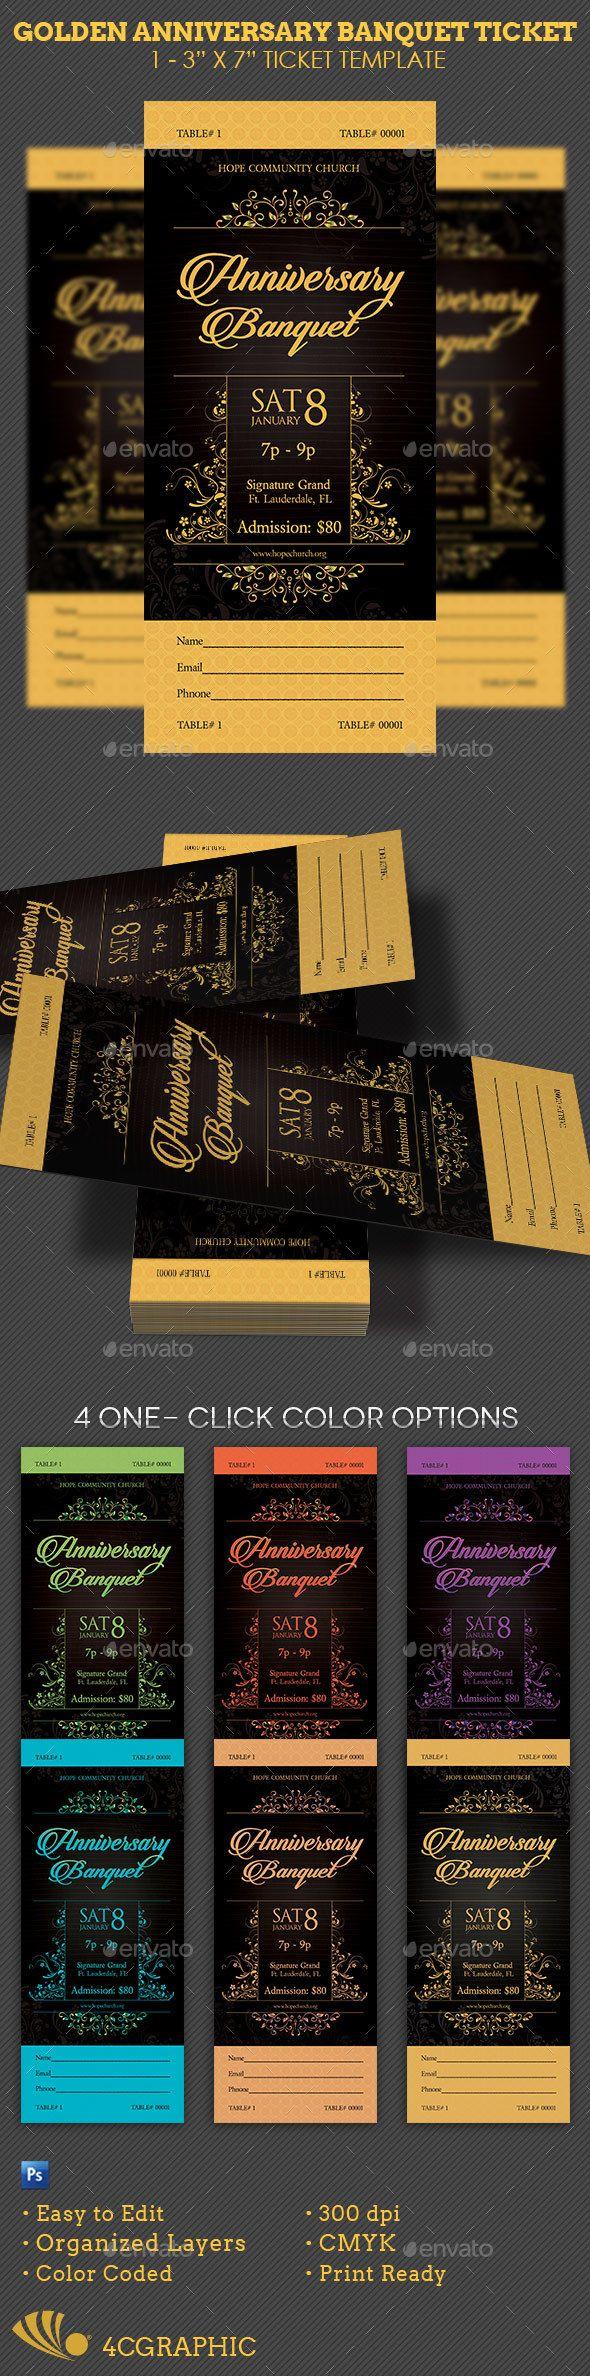 17 best ideas about ticket template my pics golden anniversary banquet ticket template